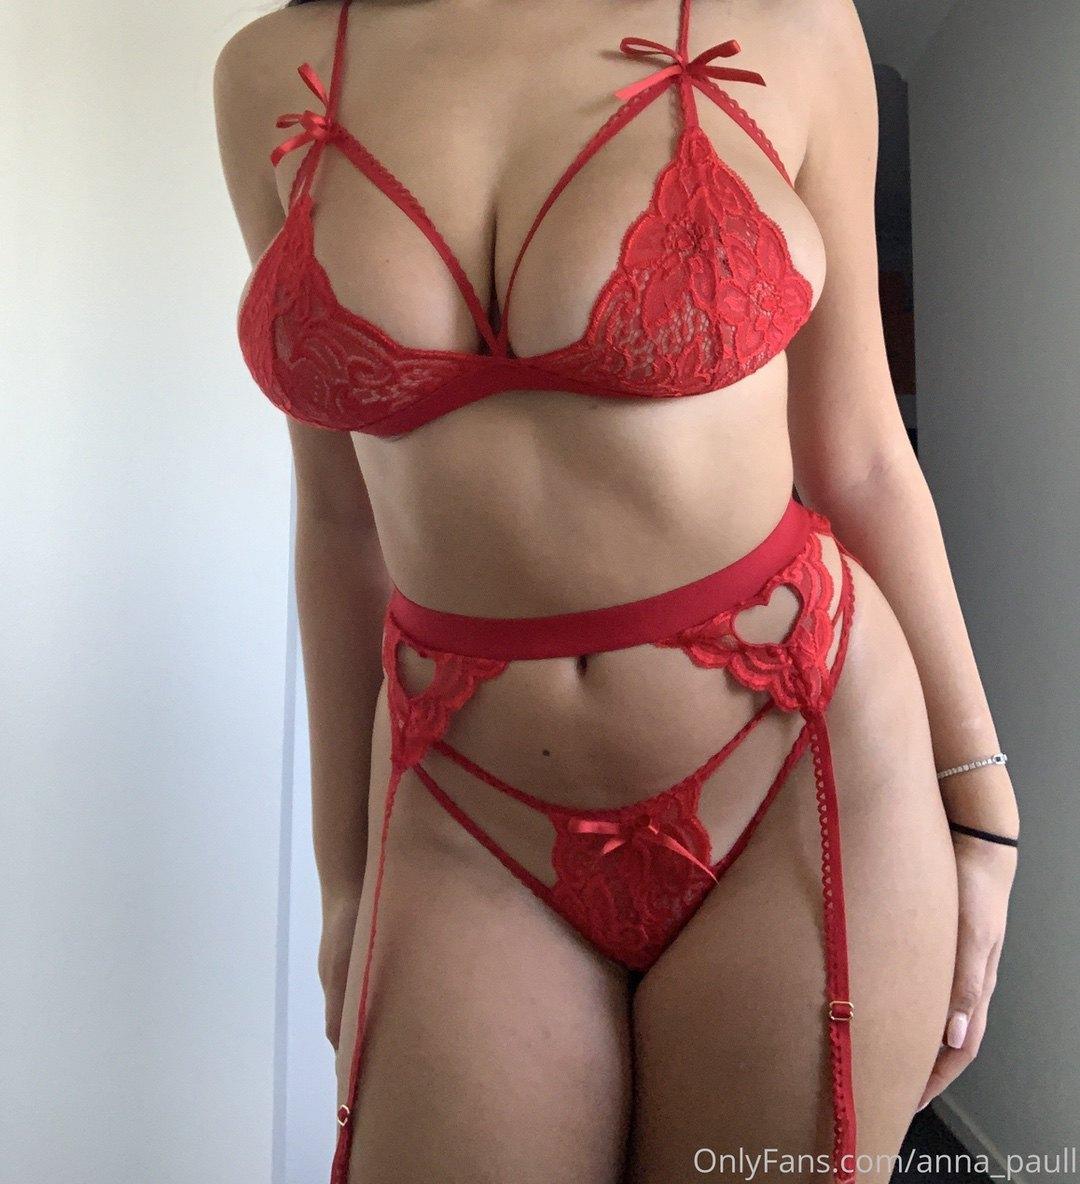 Anna Paul Anna Paull Onlyfans Nudes Leaks 0013